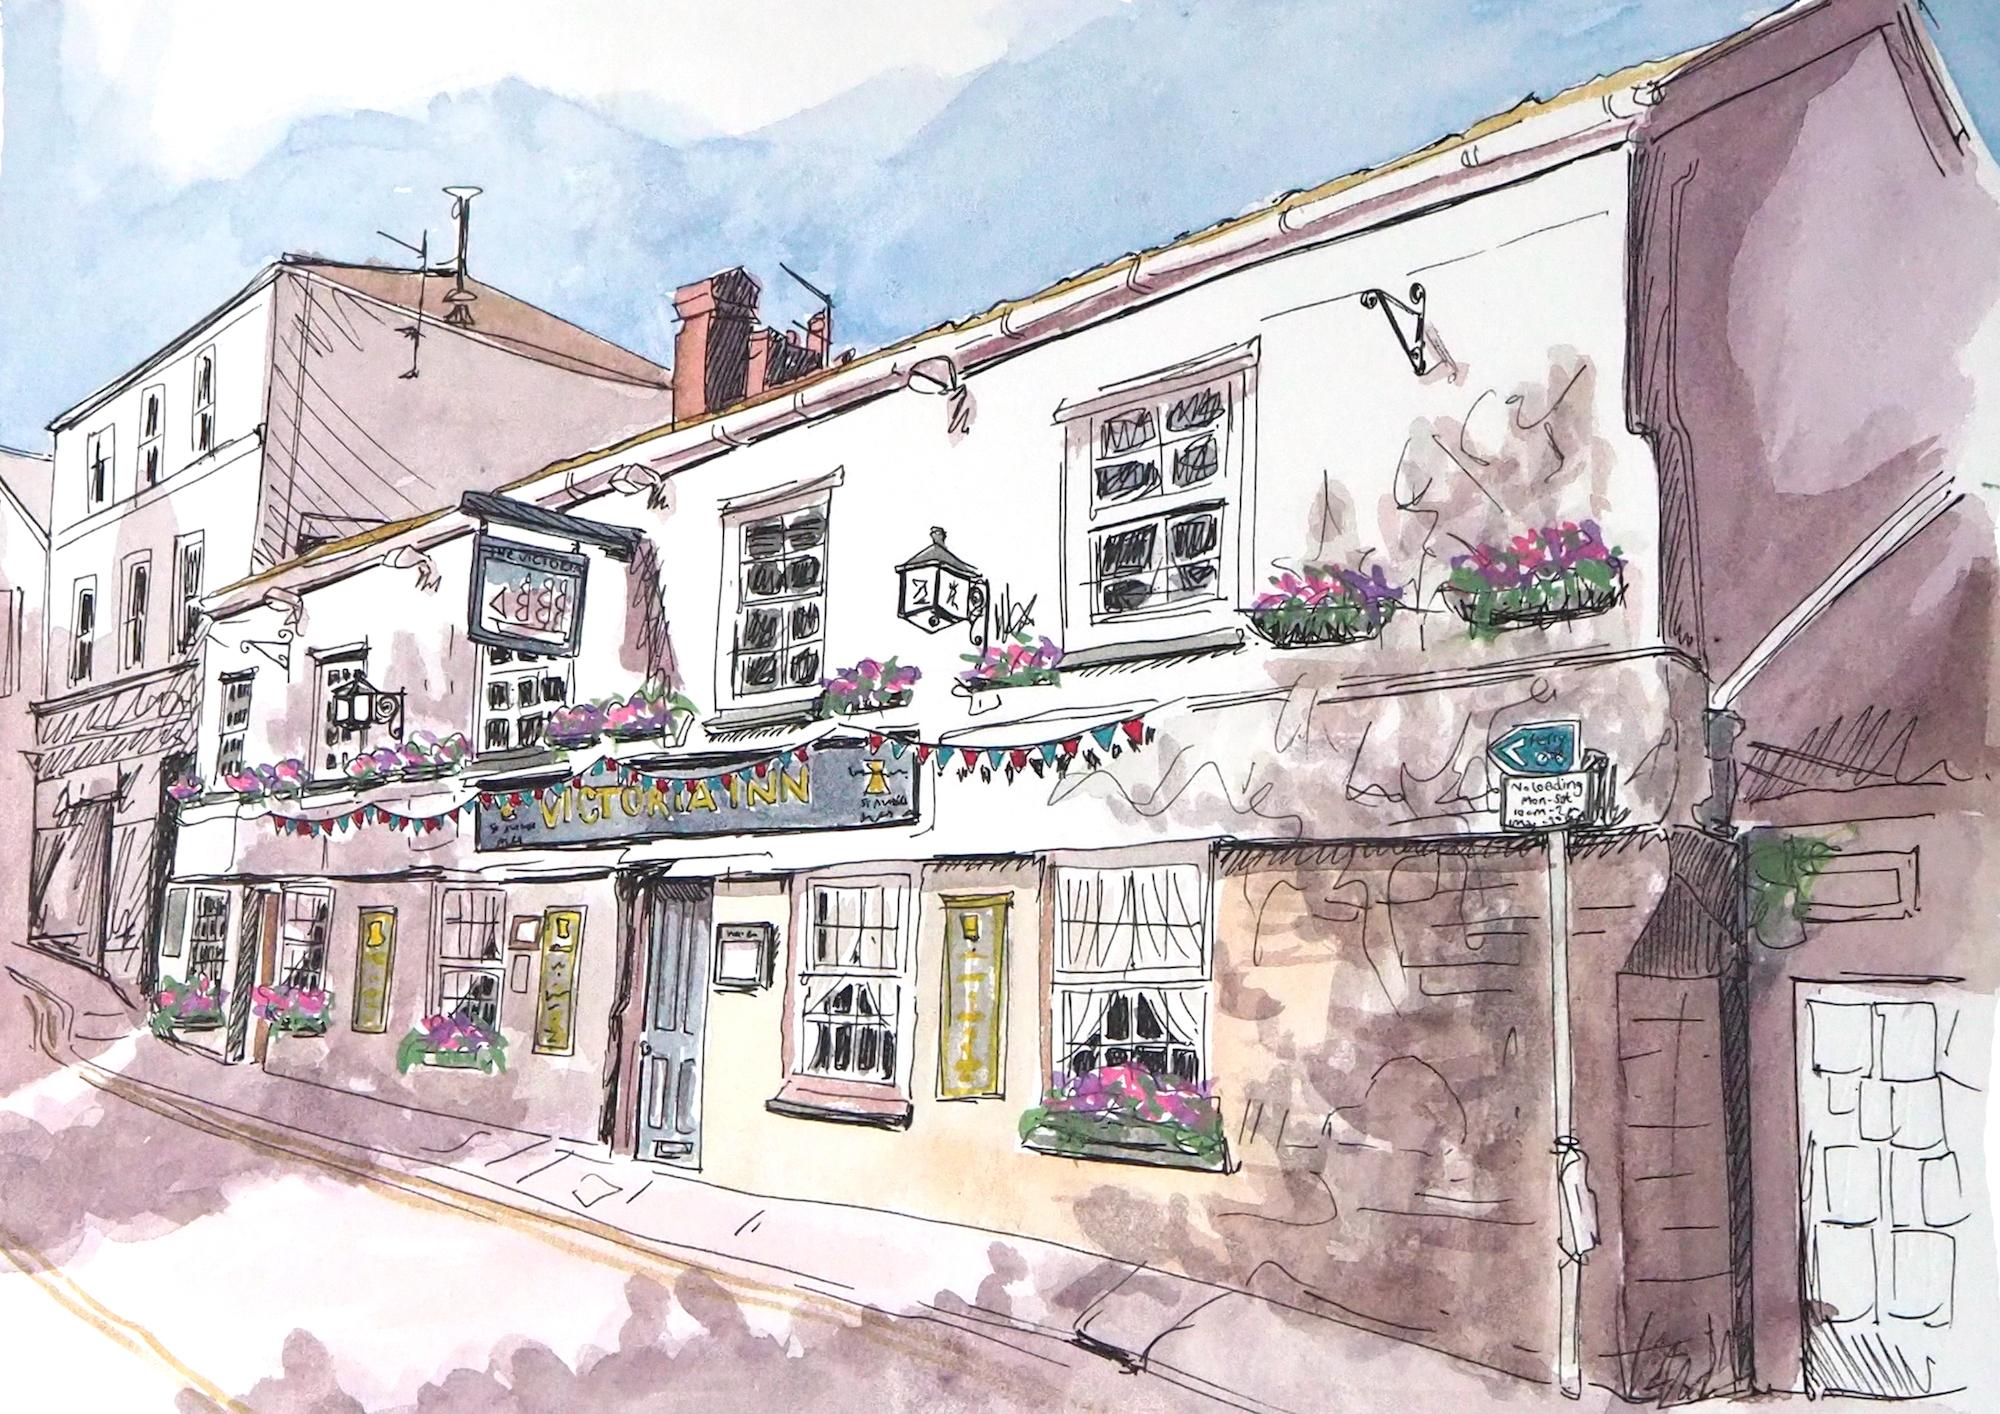 Victoria Inn Salcombe.jpg